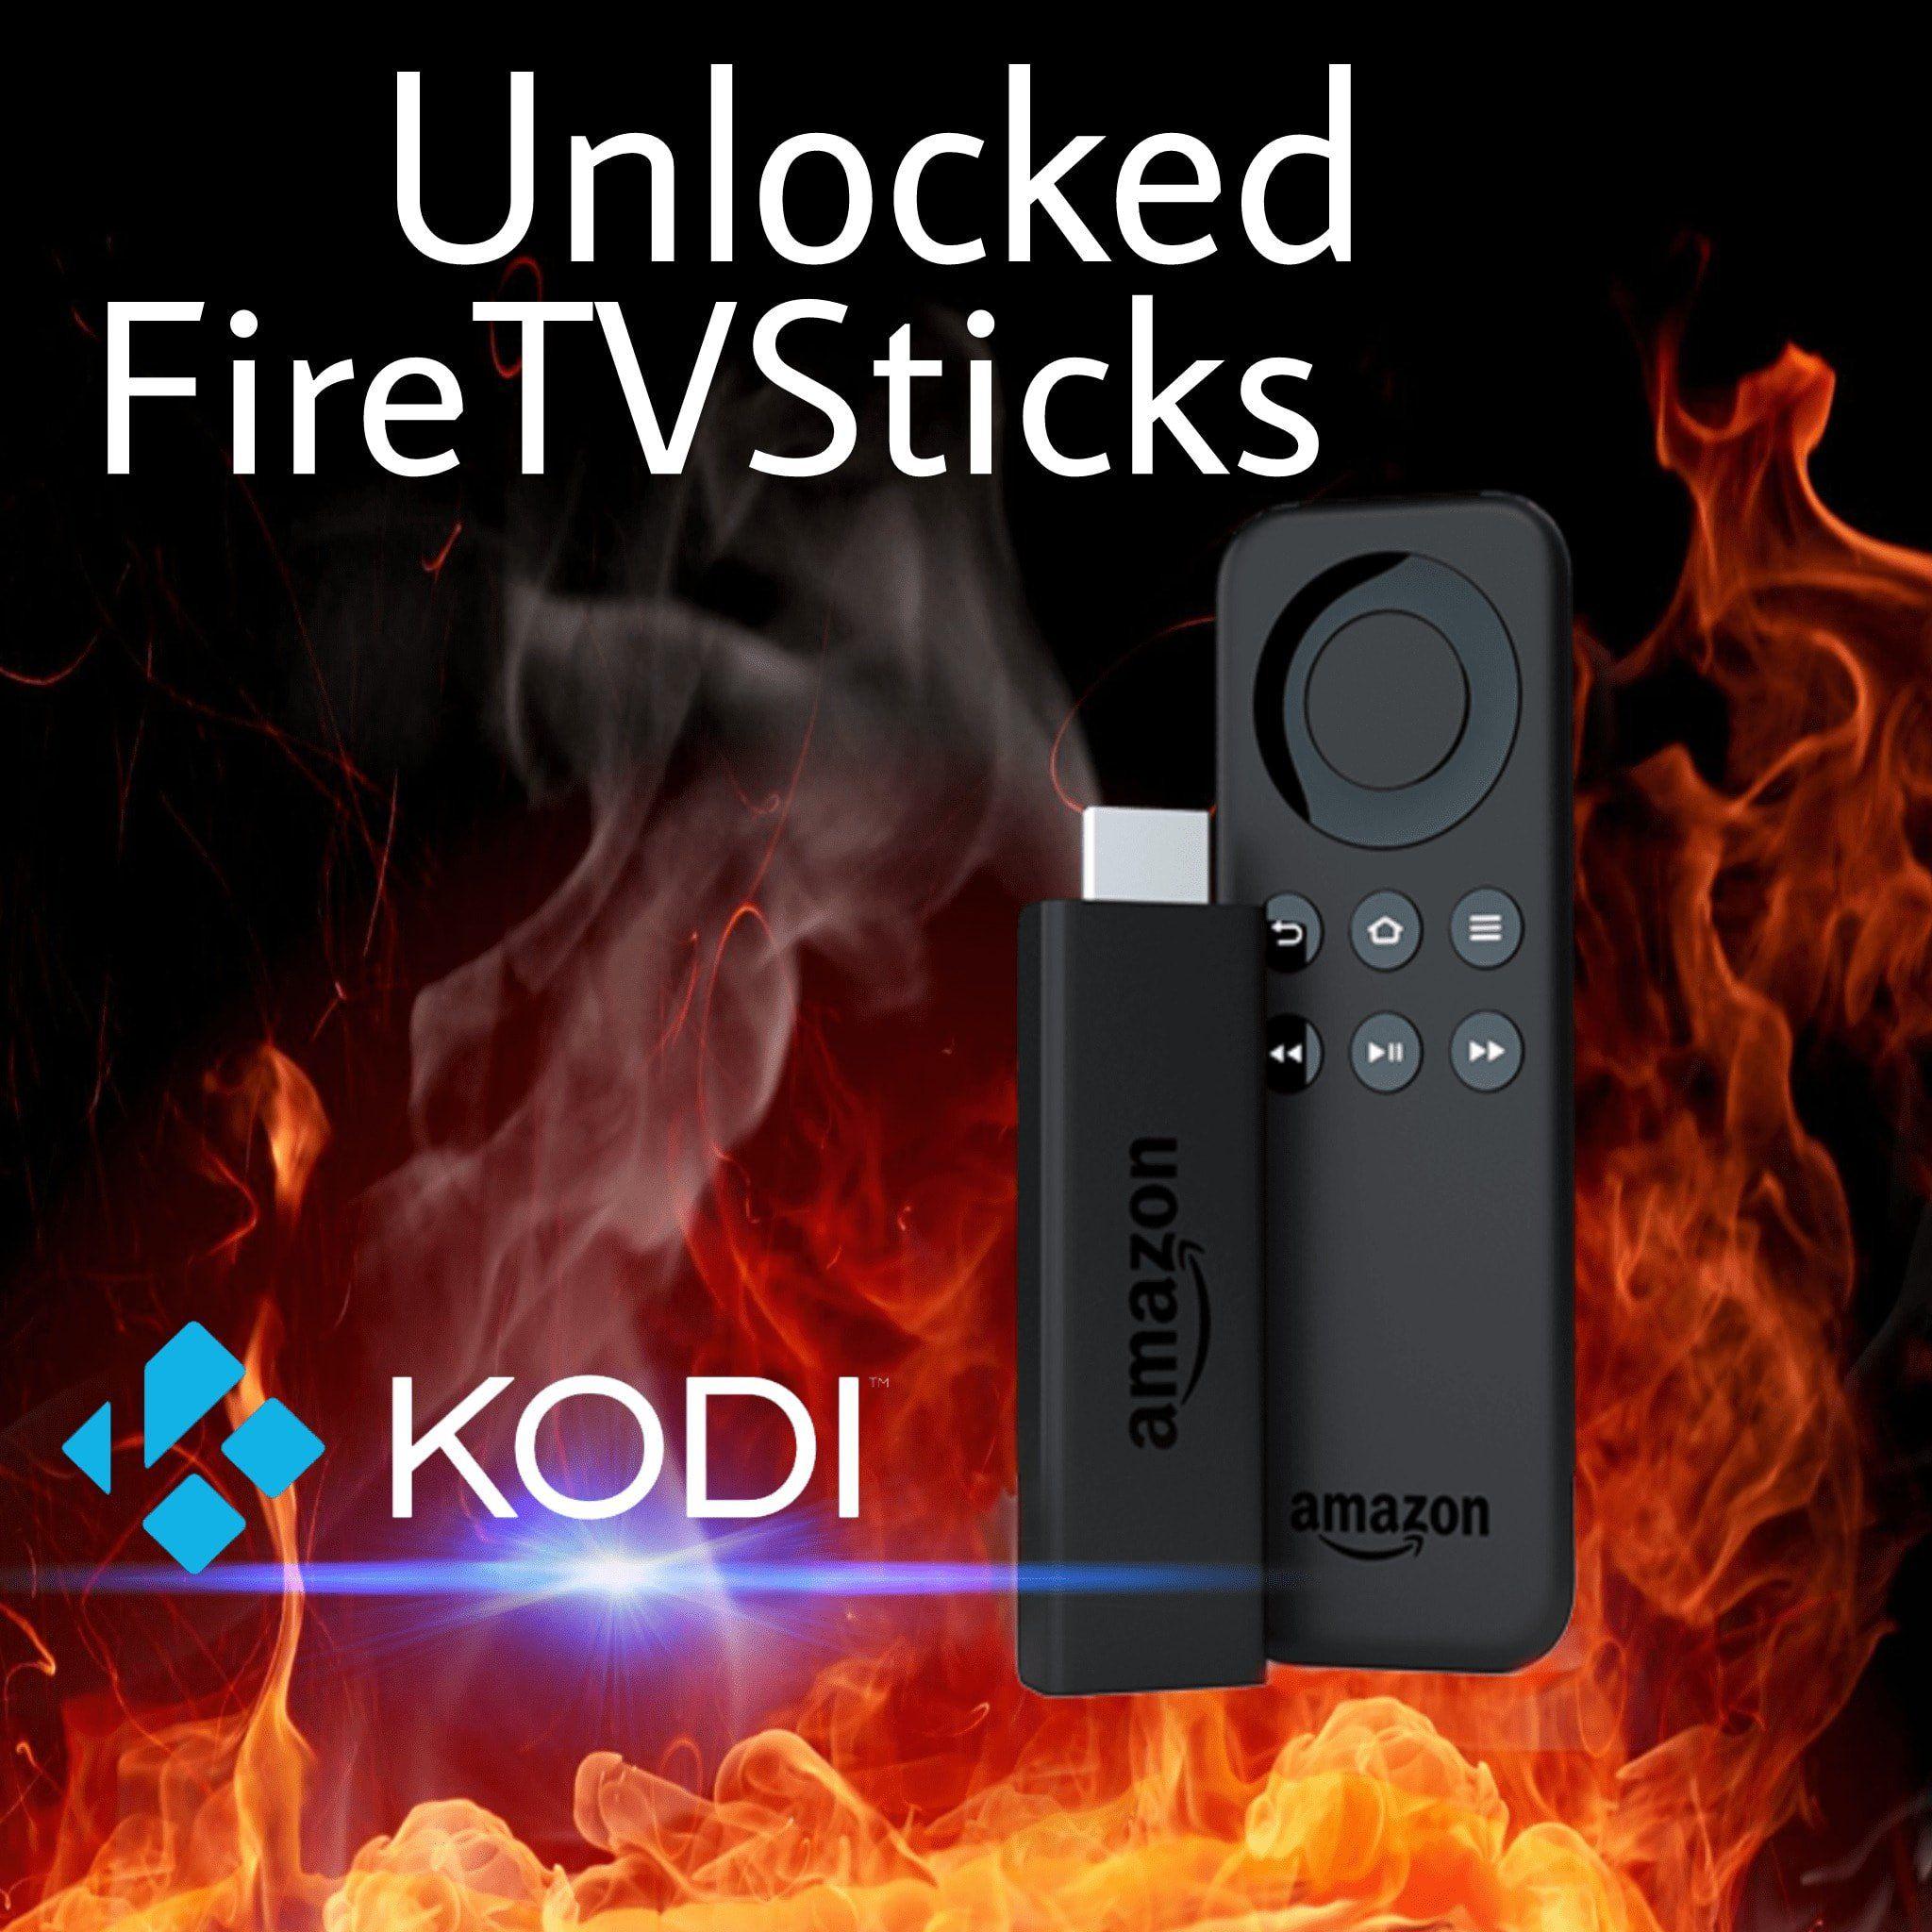 Can You Watch Live Tv On Kodi Fire Stick Unlocked Amazon Fire Stick With Kodi And Mobdro Amazon Fire Stick Fire Tv Stick Amazon Fire Stick Kodi